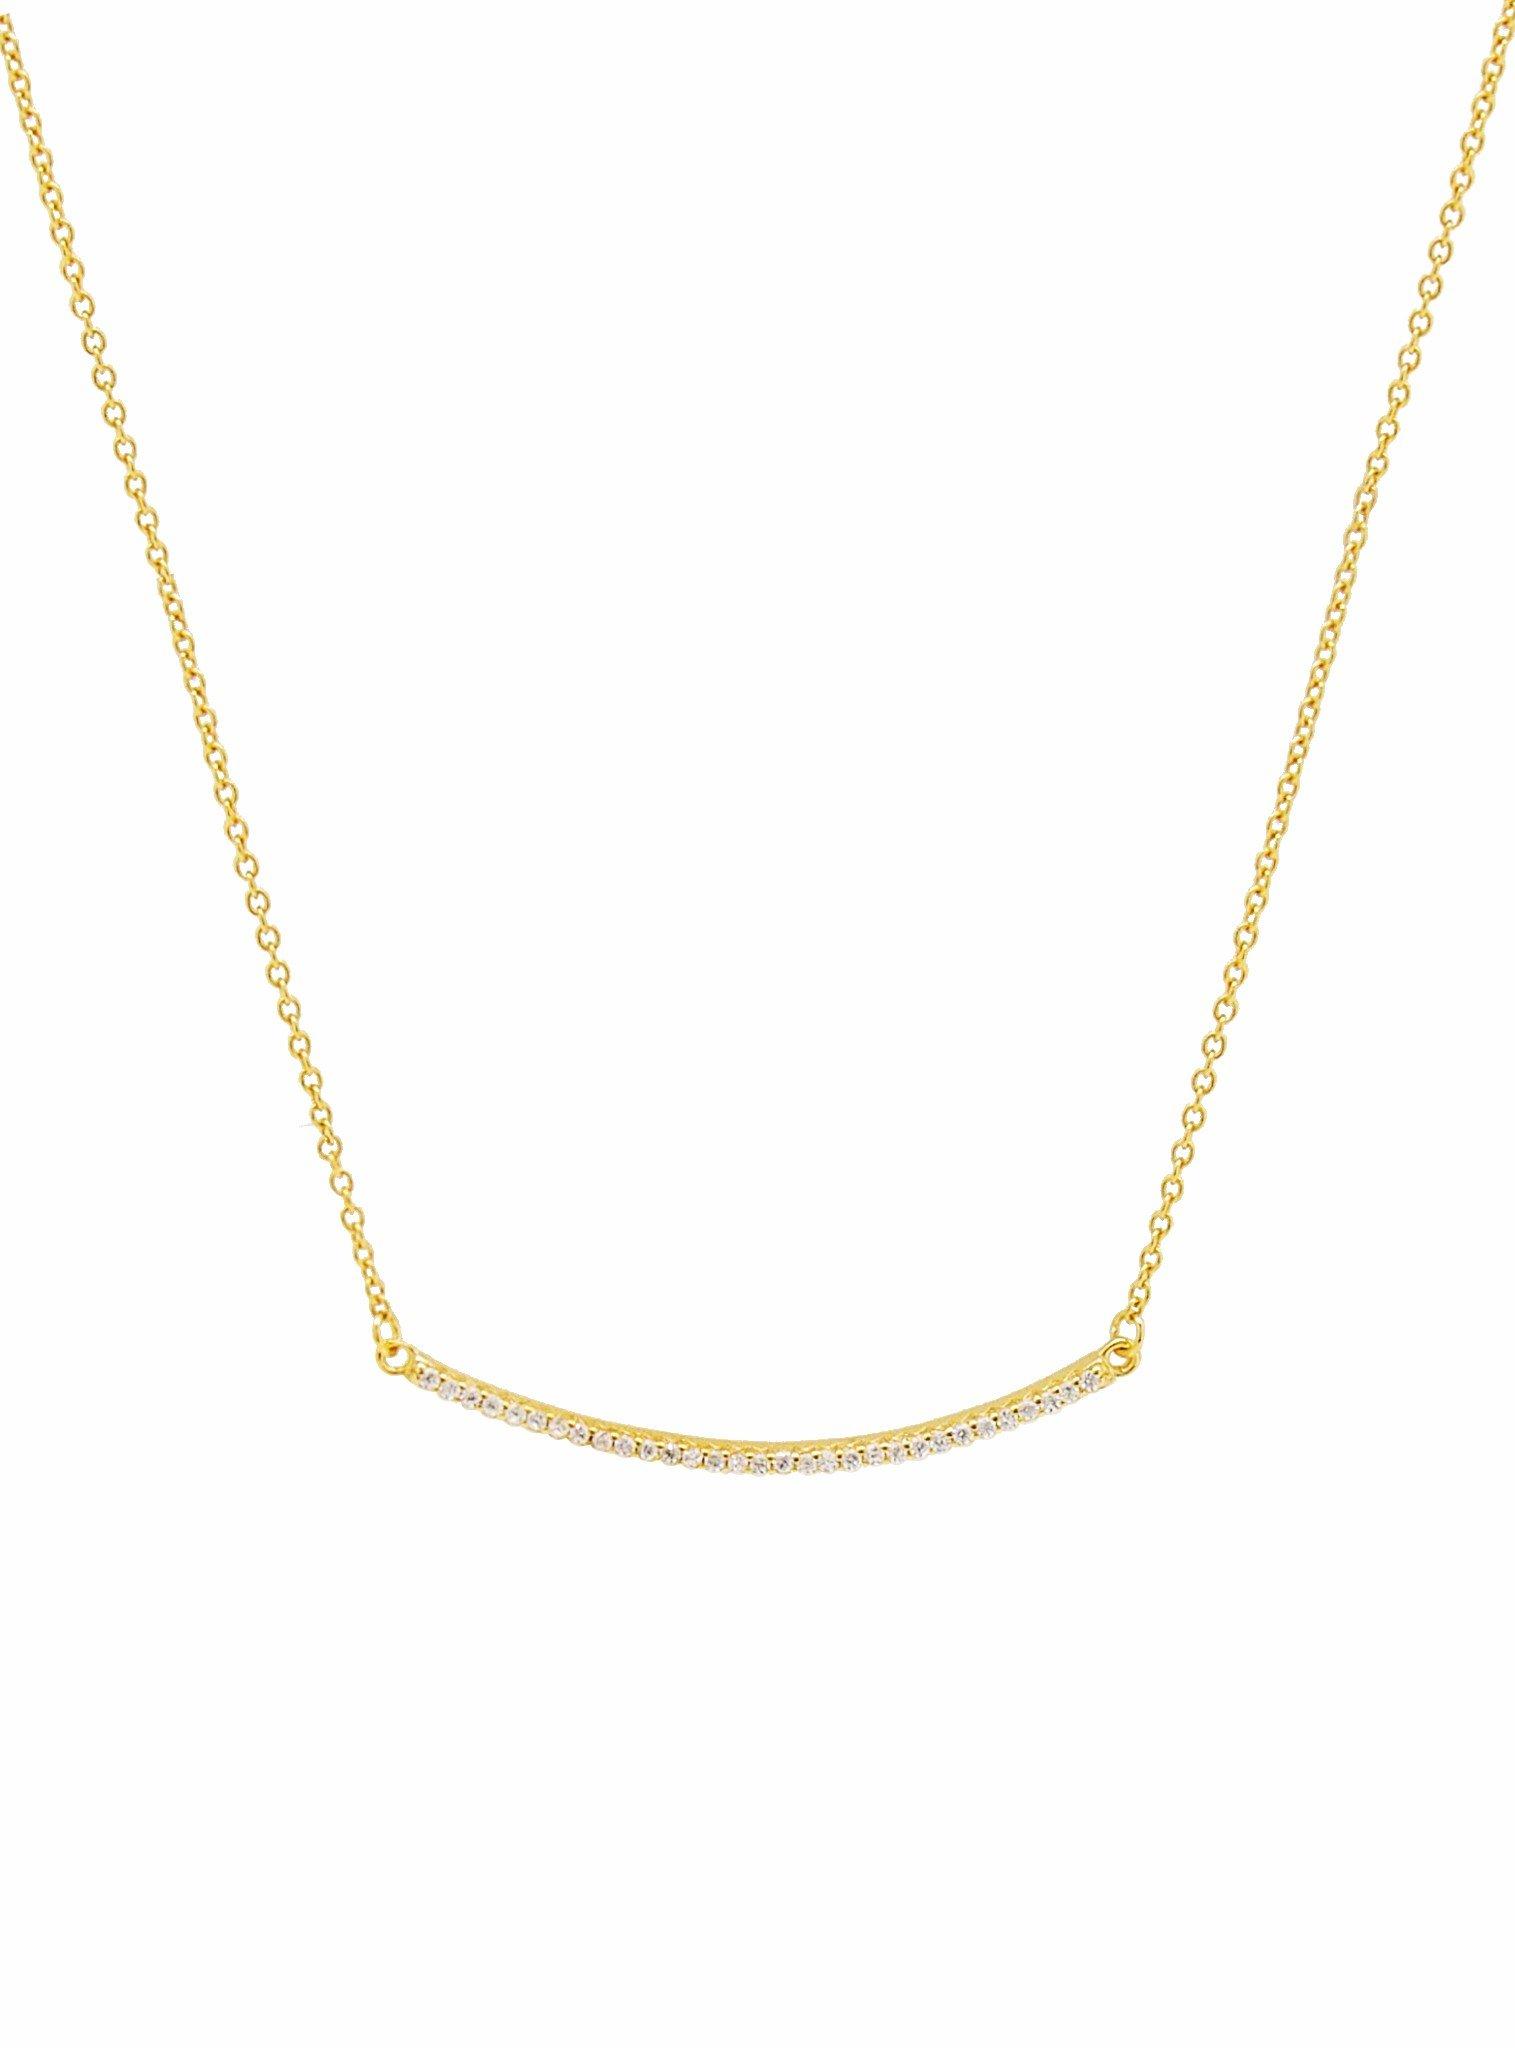 Emilia CZ Pave Set Bar Necklace in Gold